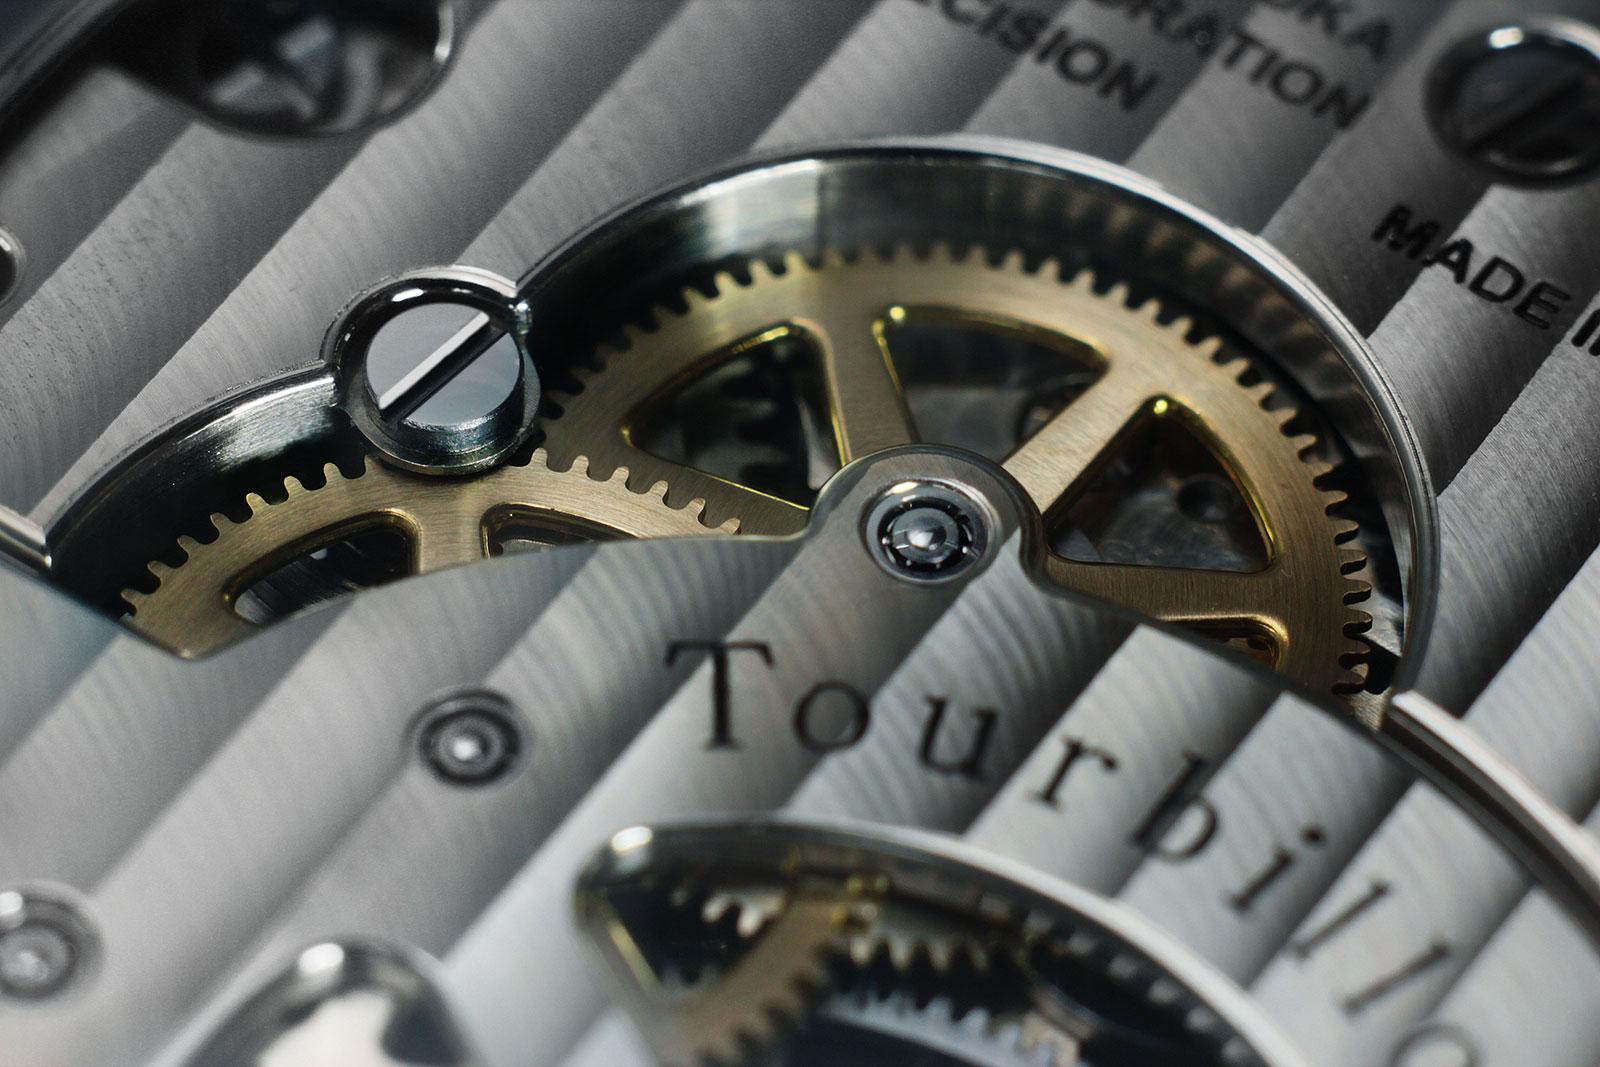 Gears clipart tourbillon The Manufacturing Tourbillon Project Introducing